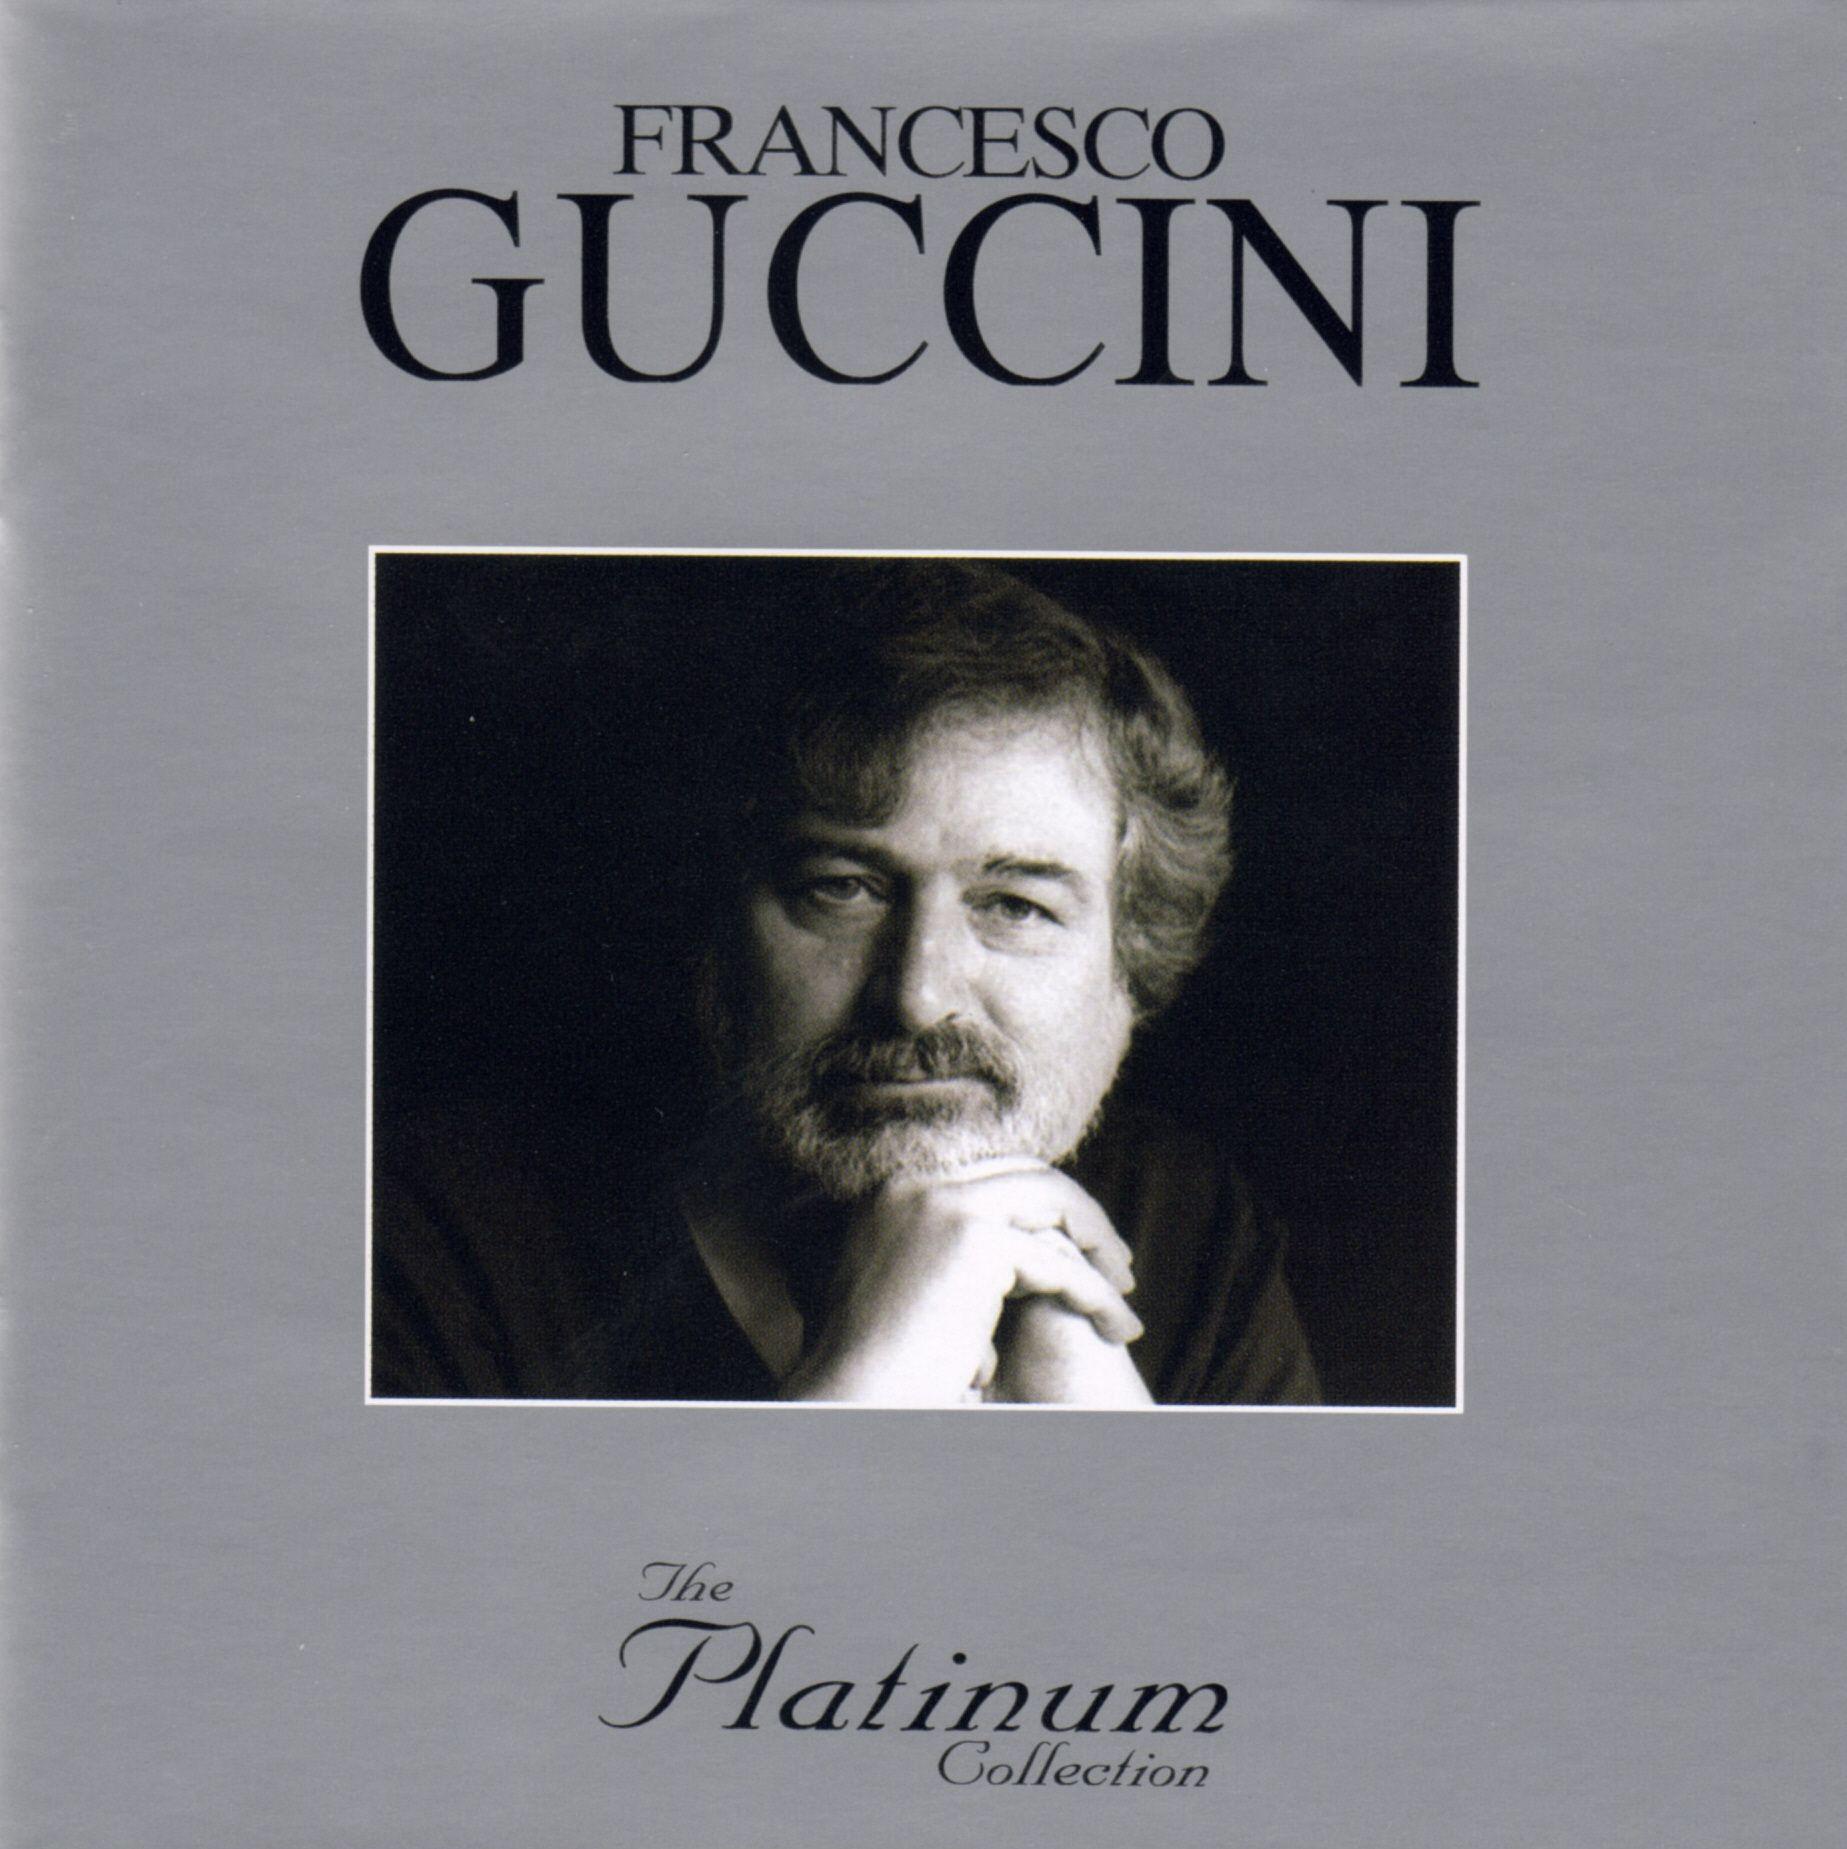 mp3 francesco guccini